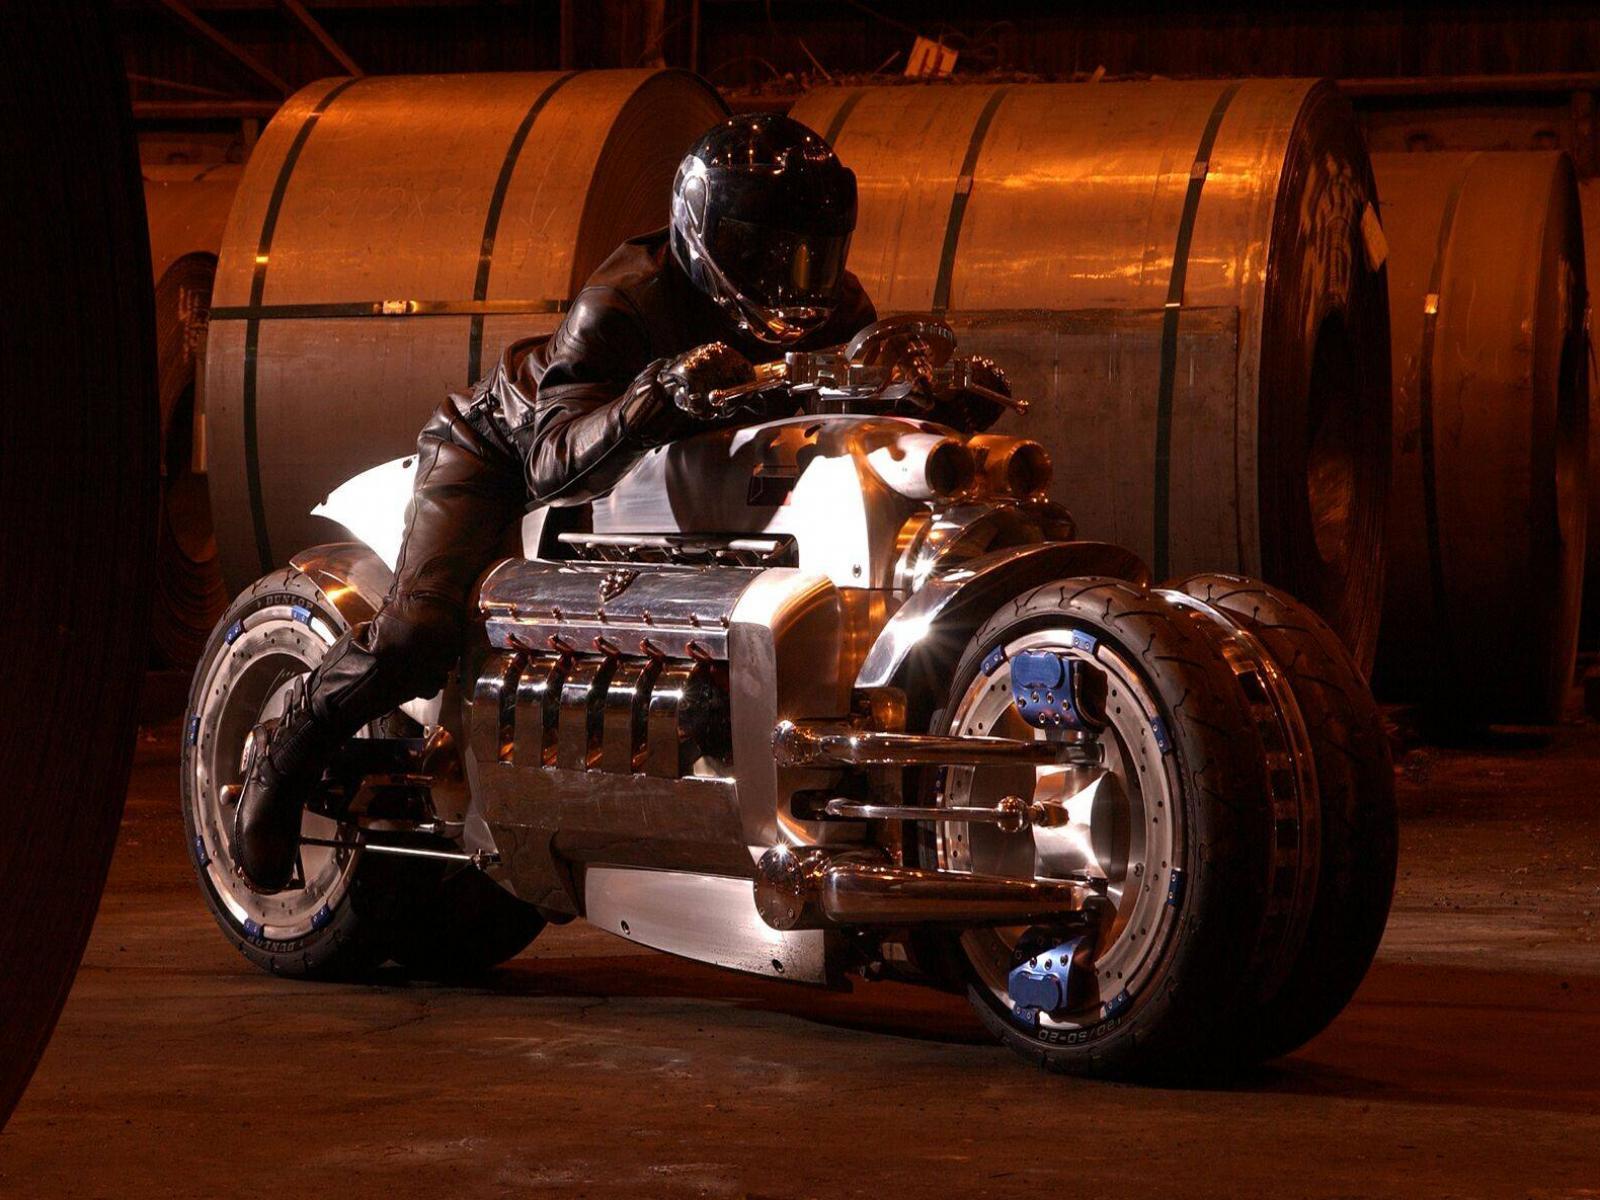 Обои самый быстрый мотоцикл 1600x1200